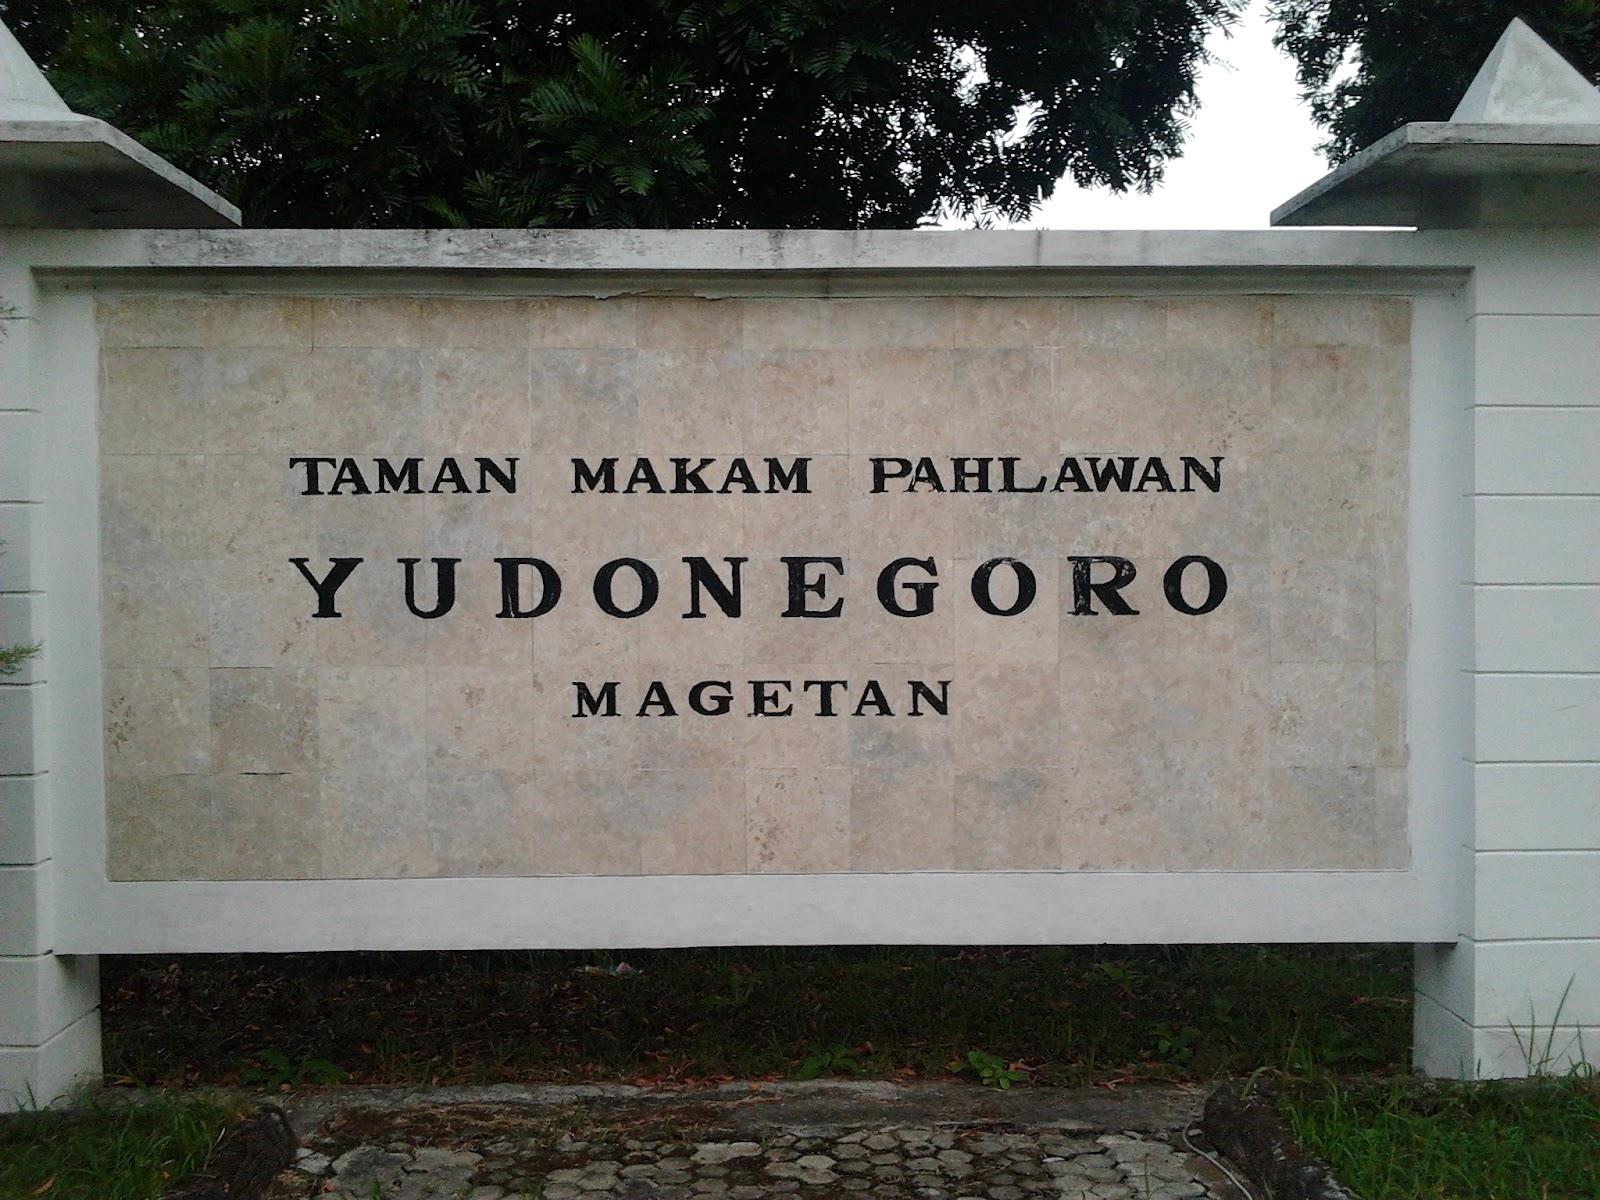 Taman Makam Pahlawan Yudhonegoro Magetan Kolam Renang Tirta Naga Sari